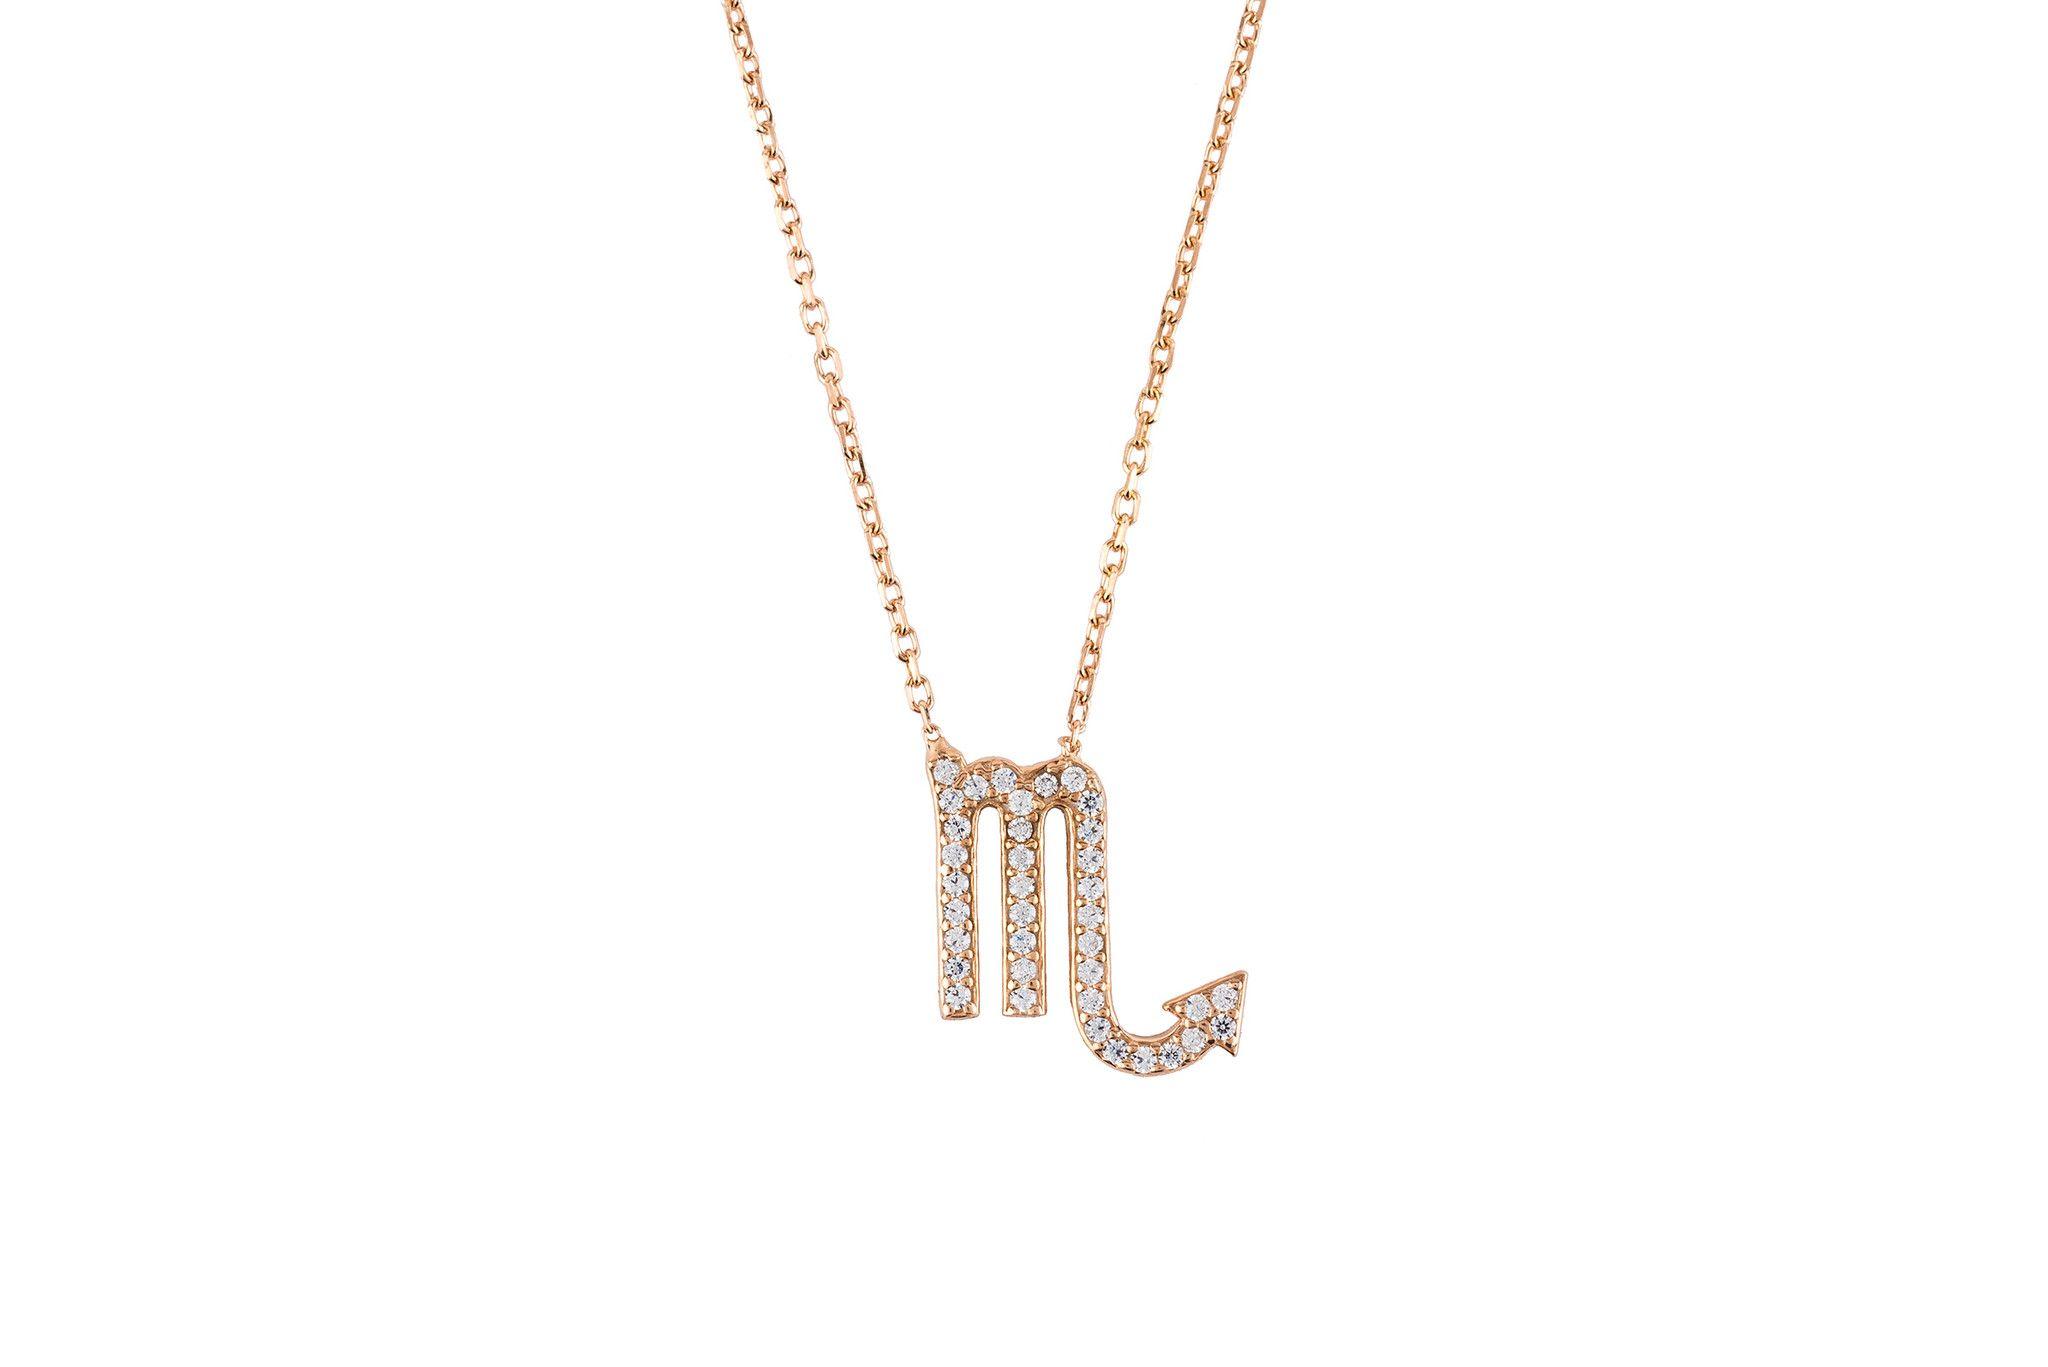 scorpio zodiac necklace rose gold Made of 925 sterling silver. Scorpios celebrate birthdays October 23 - November 21